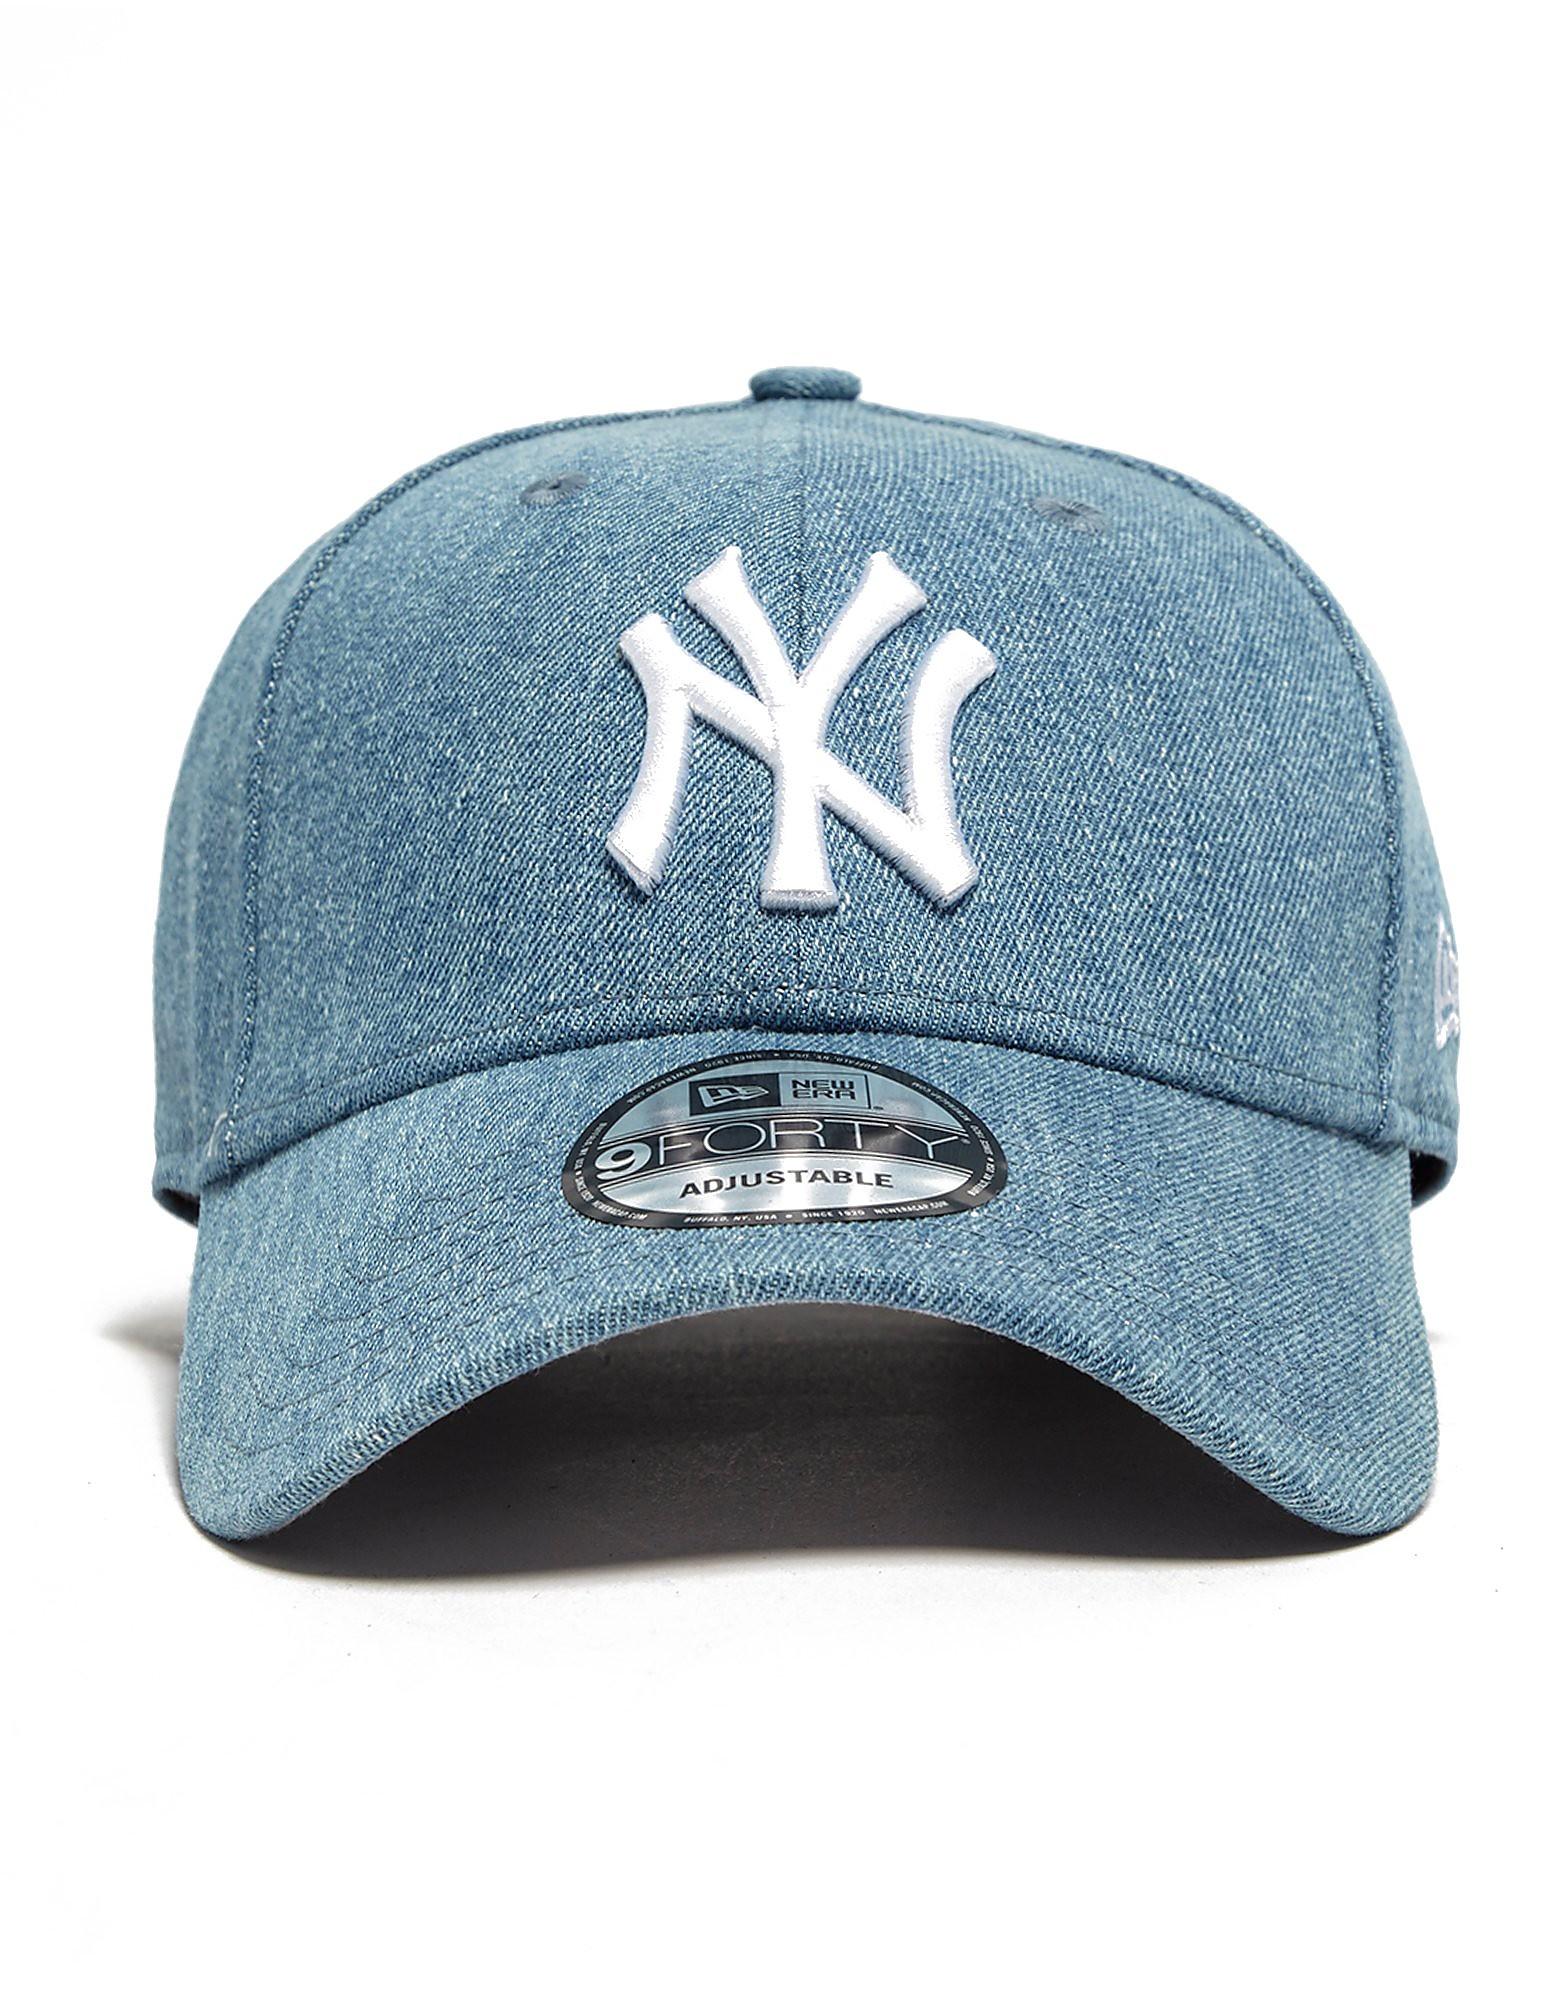 New Era MLB New York Yankees 9FORTY Strapback Cap